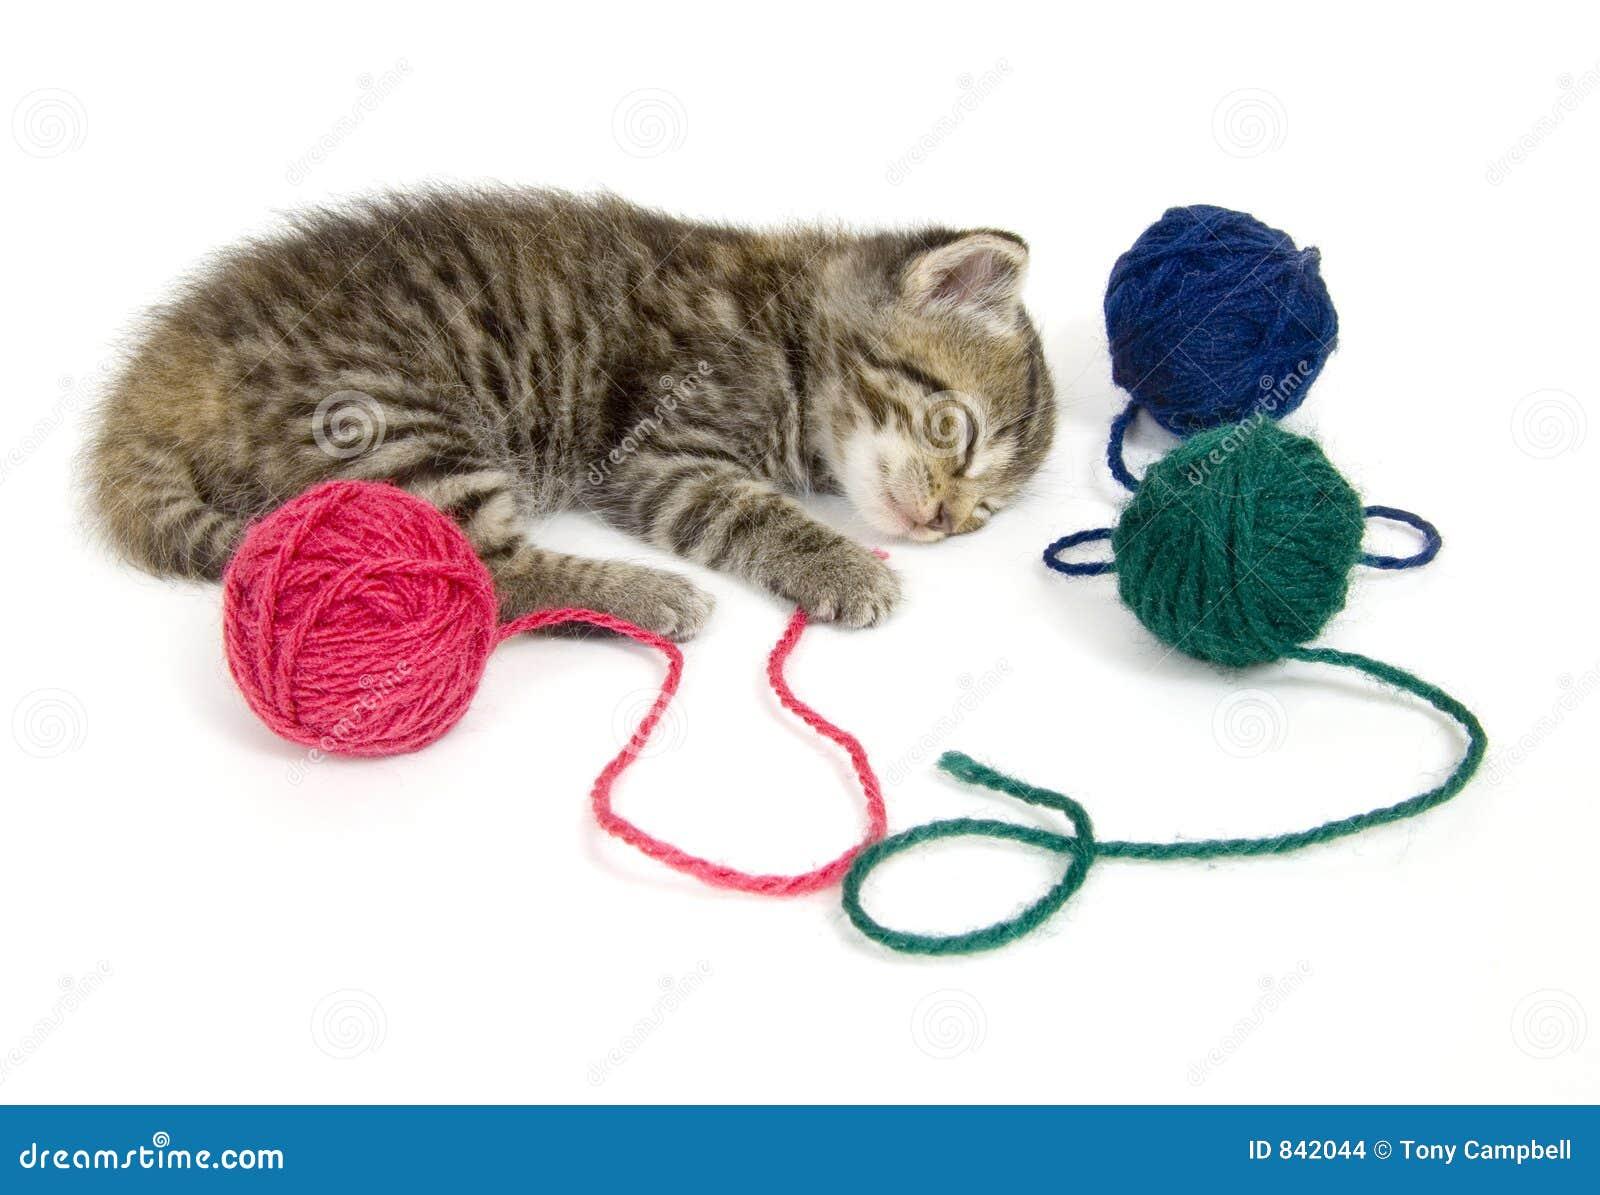 Kitten taking a nap on white background